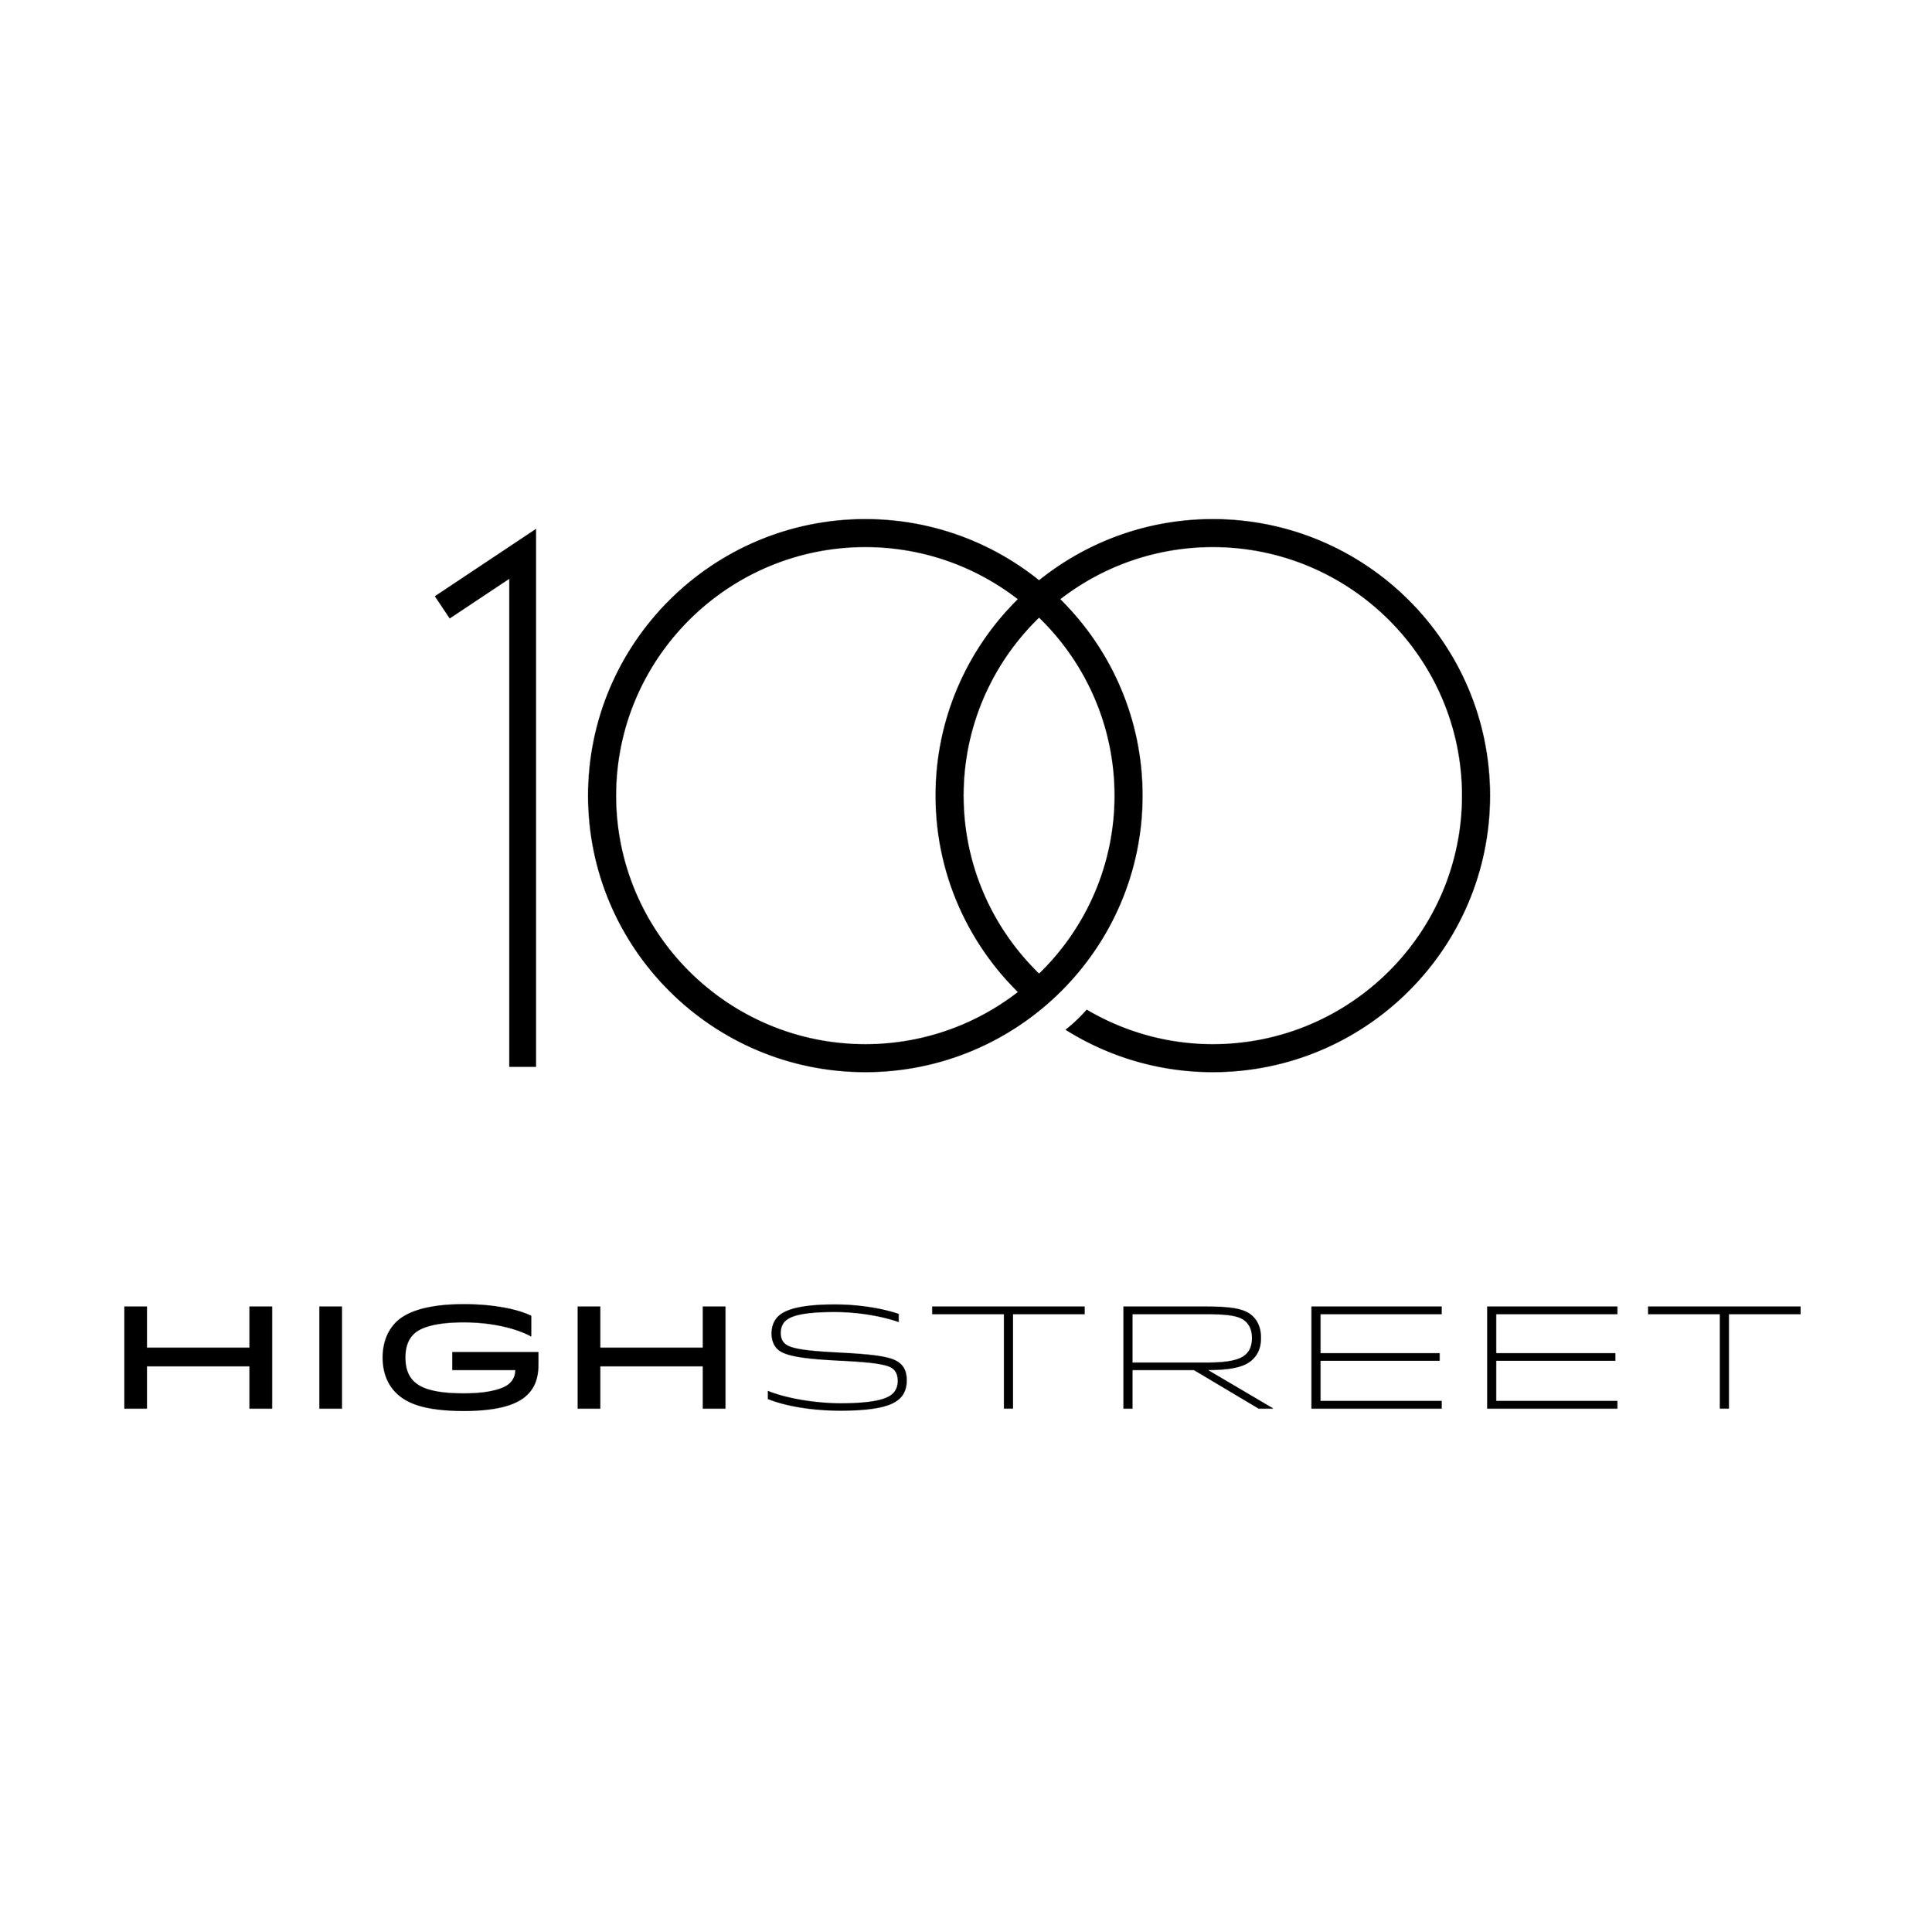 100High-LogoBLK.jpg